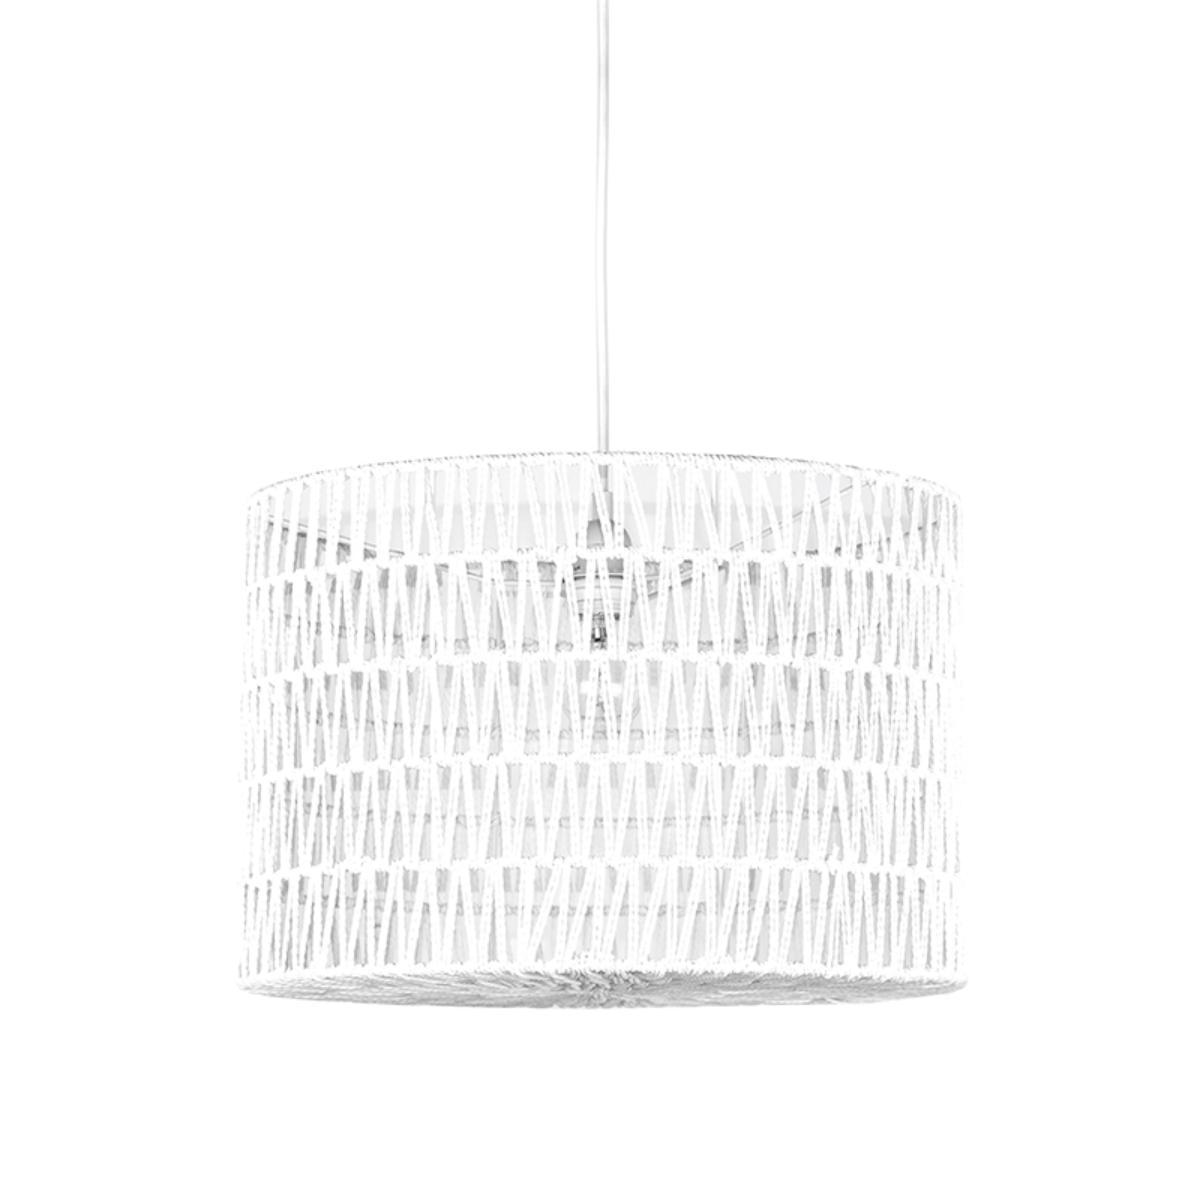 LABEL51 Hanglamp Stripe - Wit - Katoen